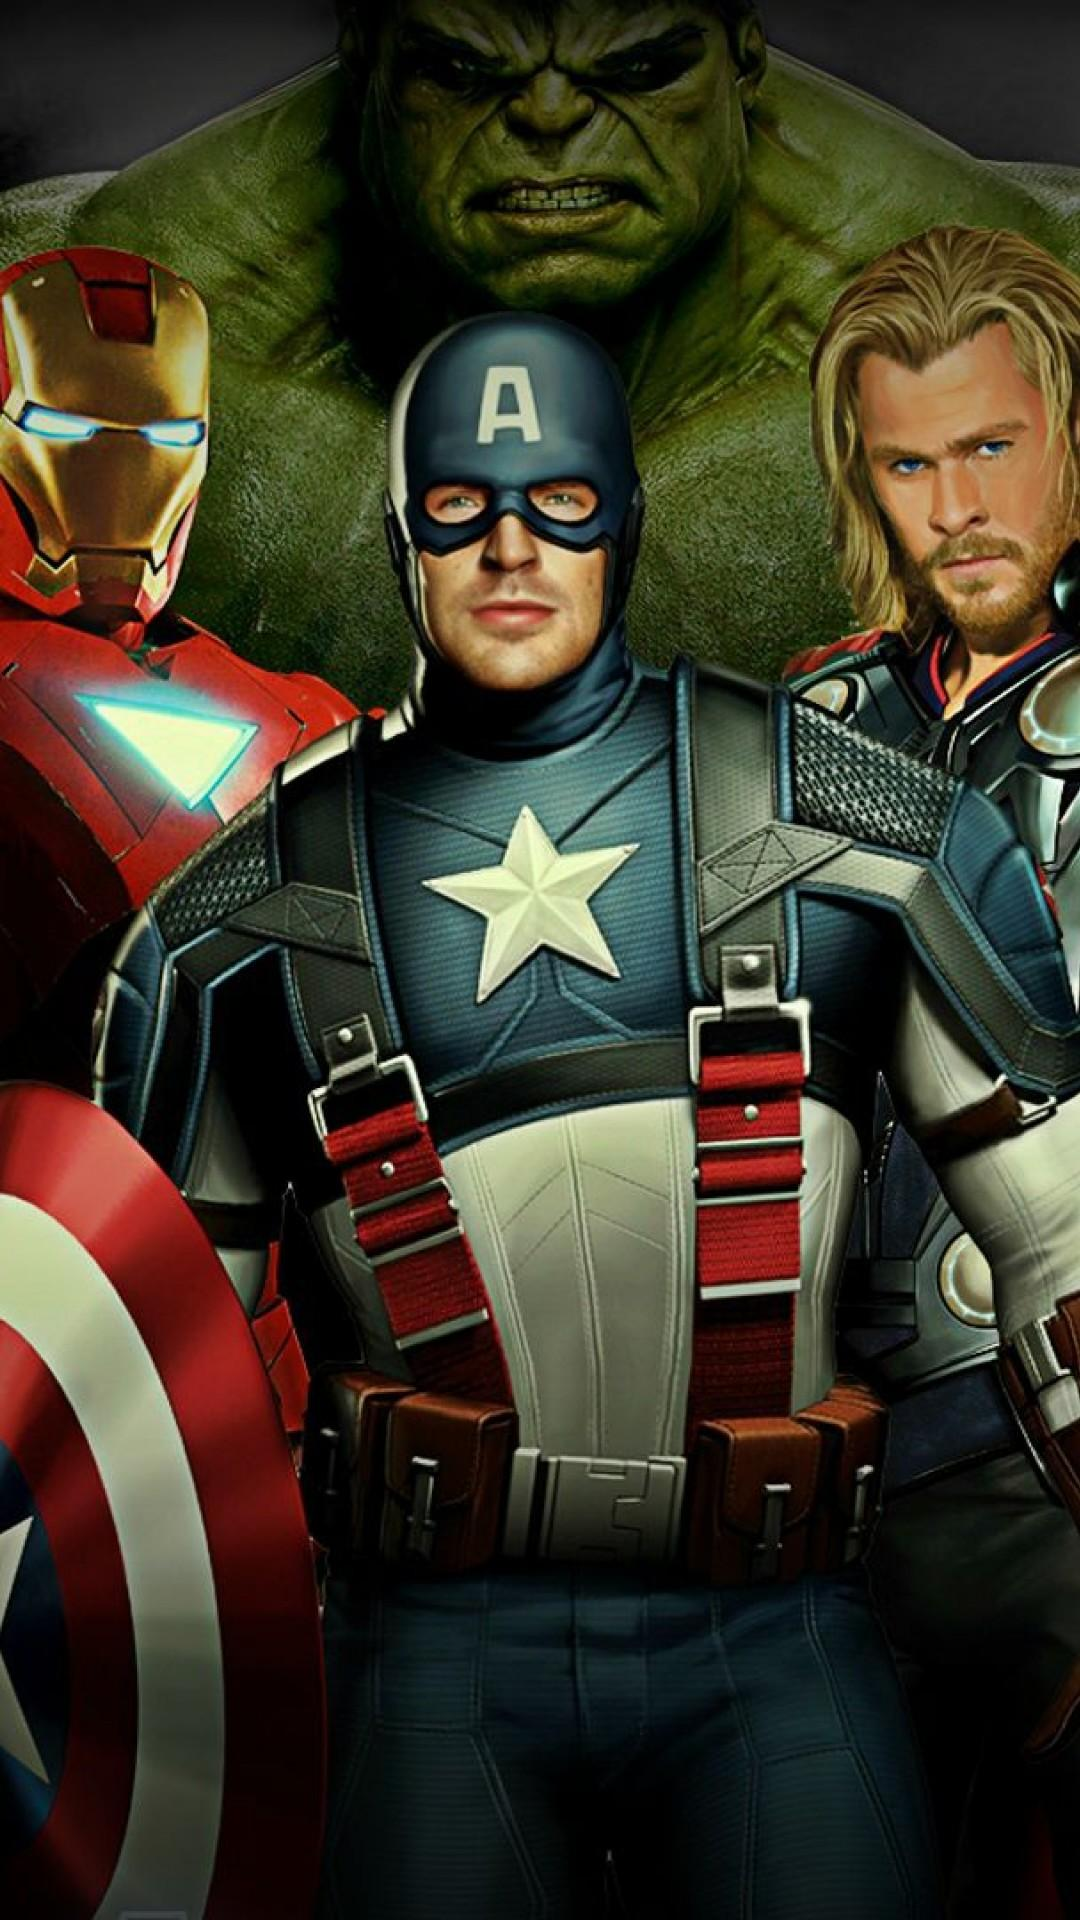 Avengers Full Hd Mobile Wallpapers - Wallpaper Cave